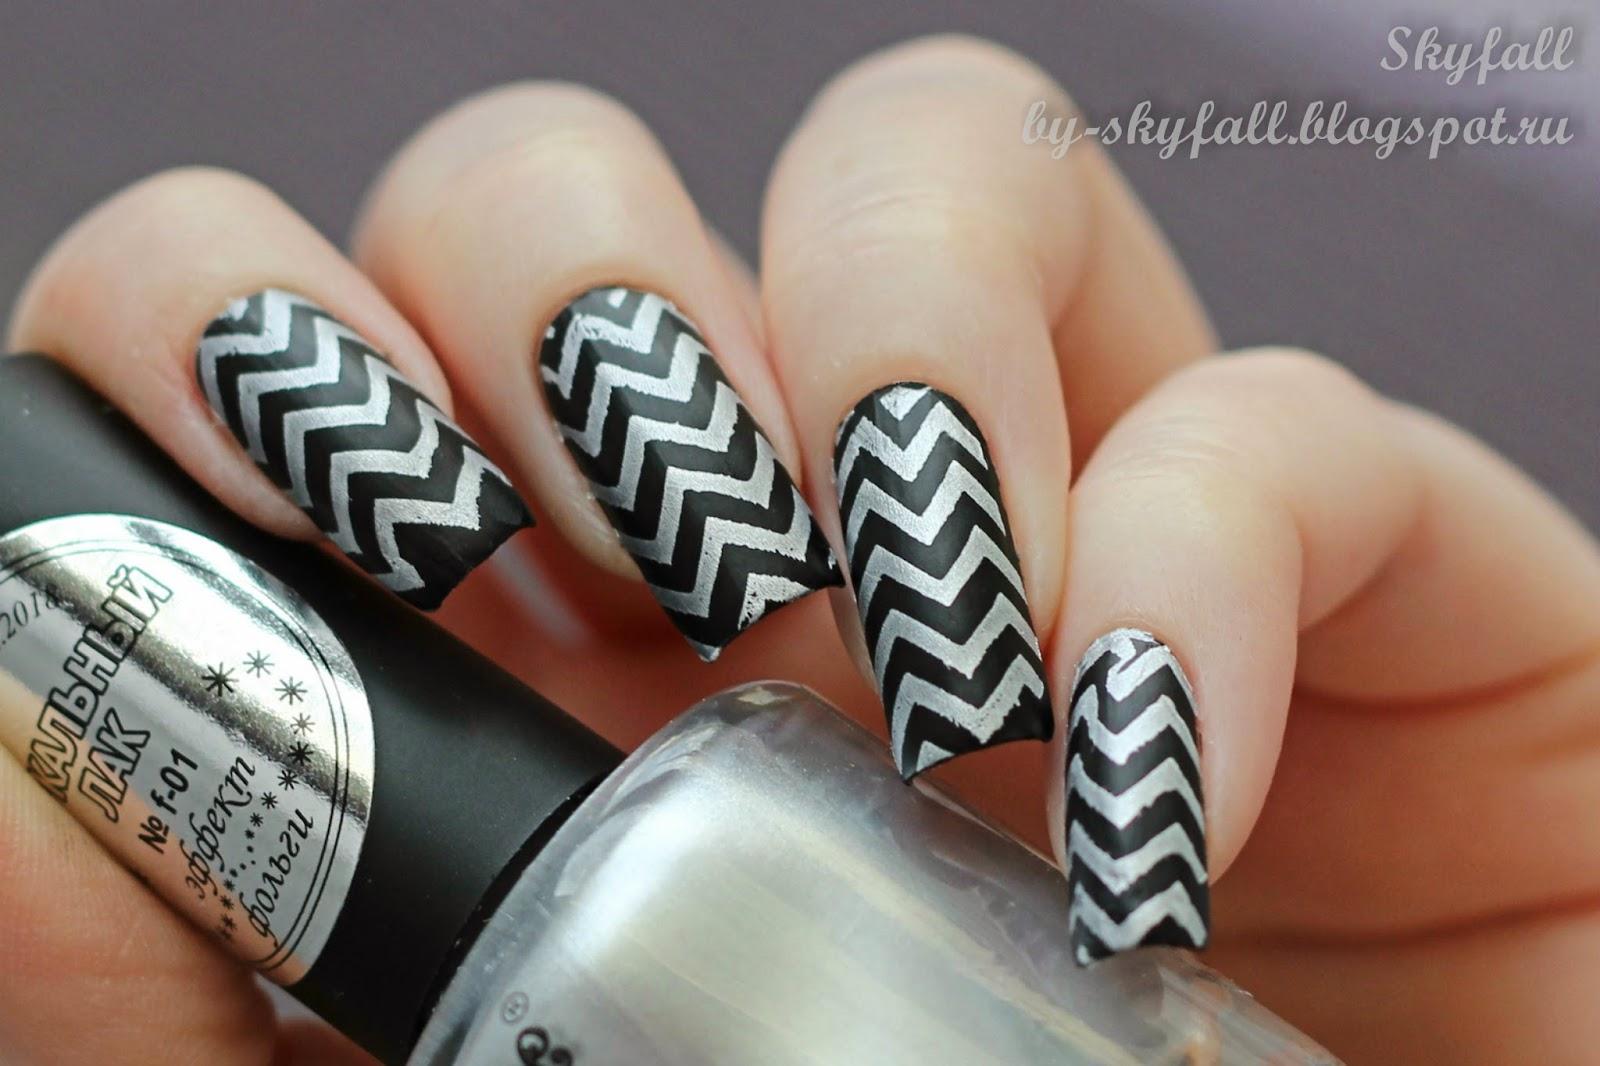 Дизайн ногтей с зигзагами фото